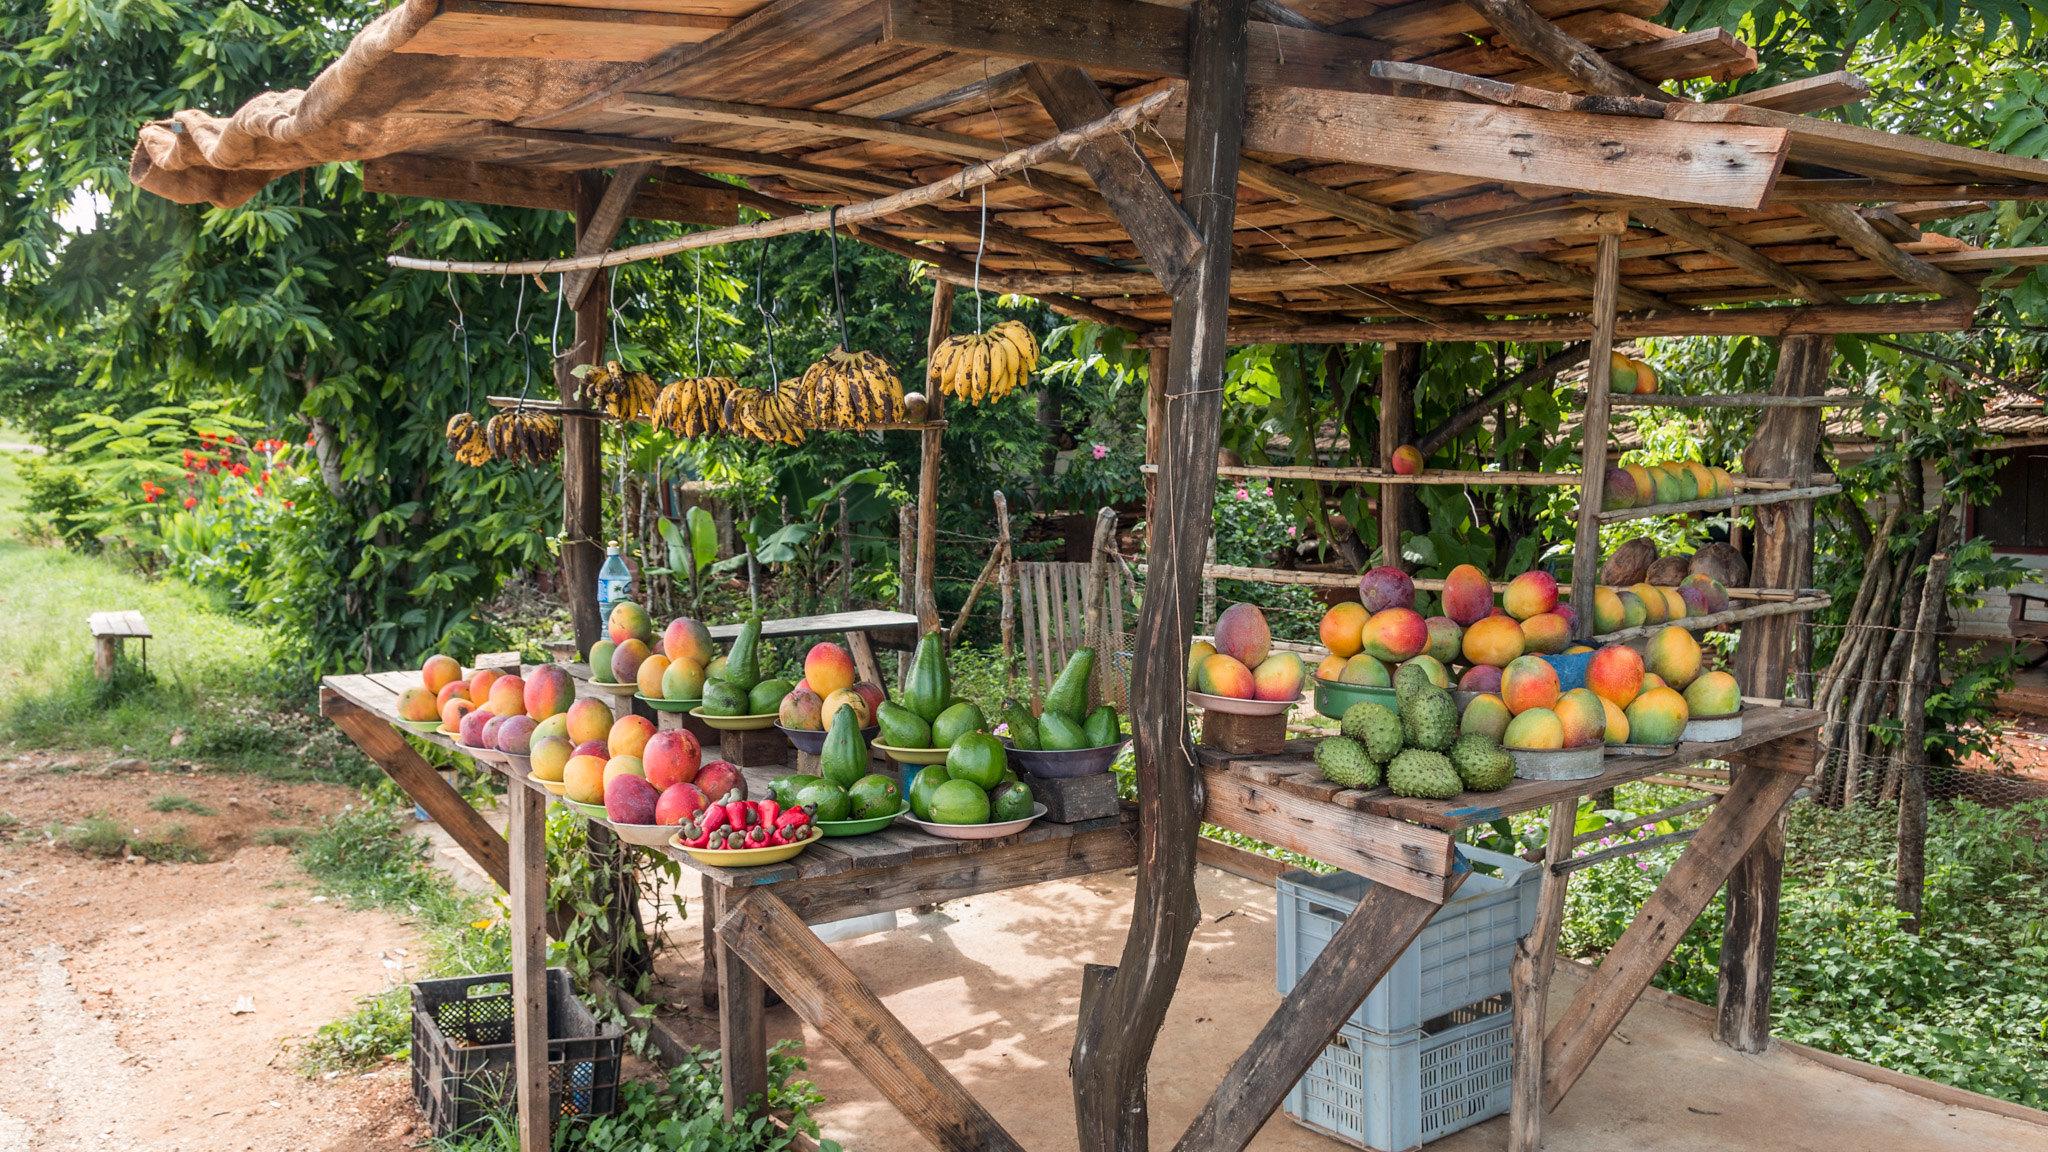 Photos blog - Trinidad - [Cuba]